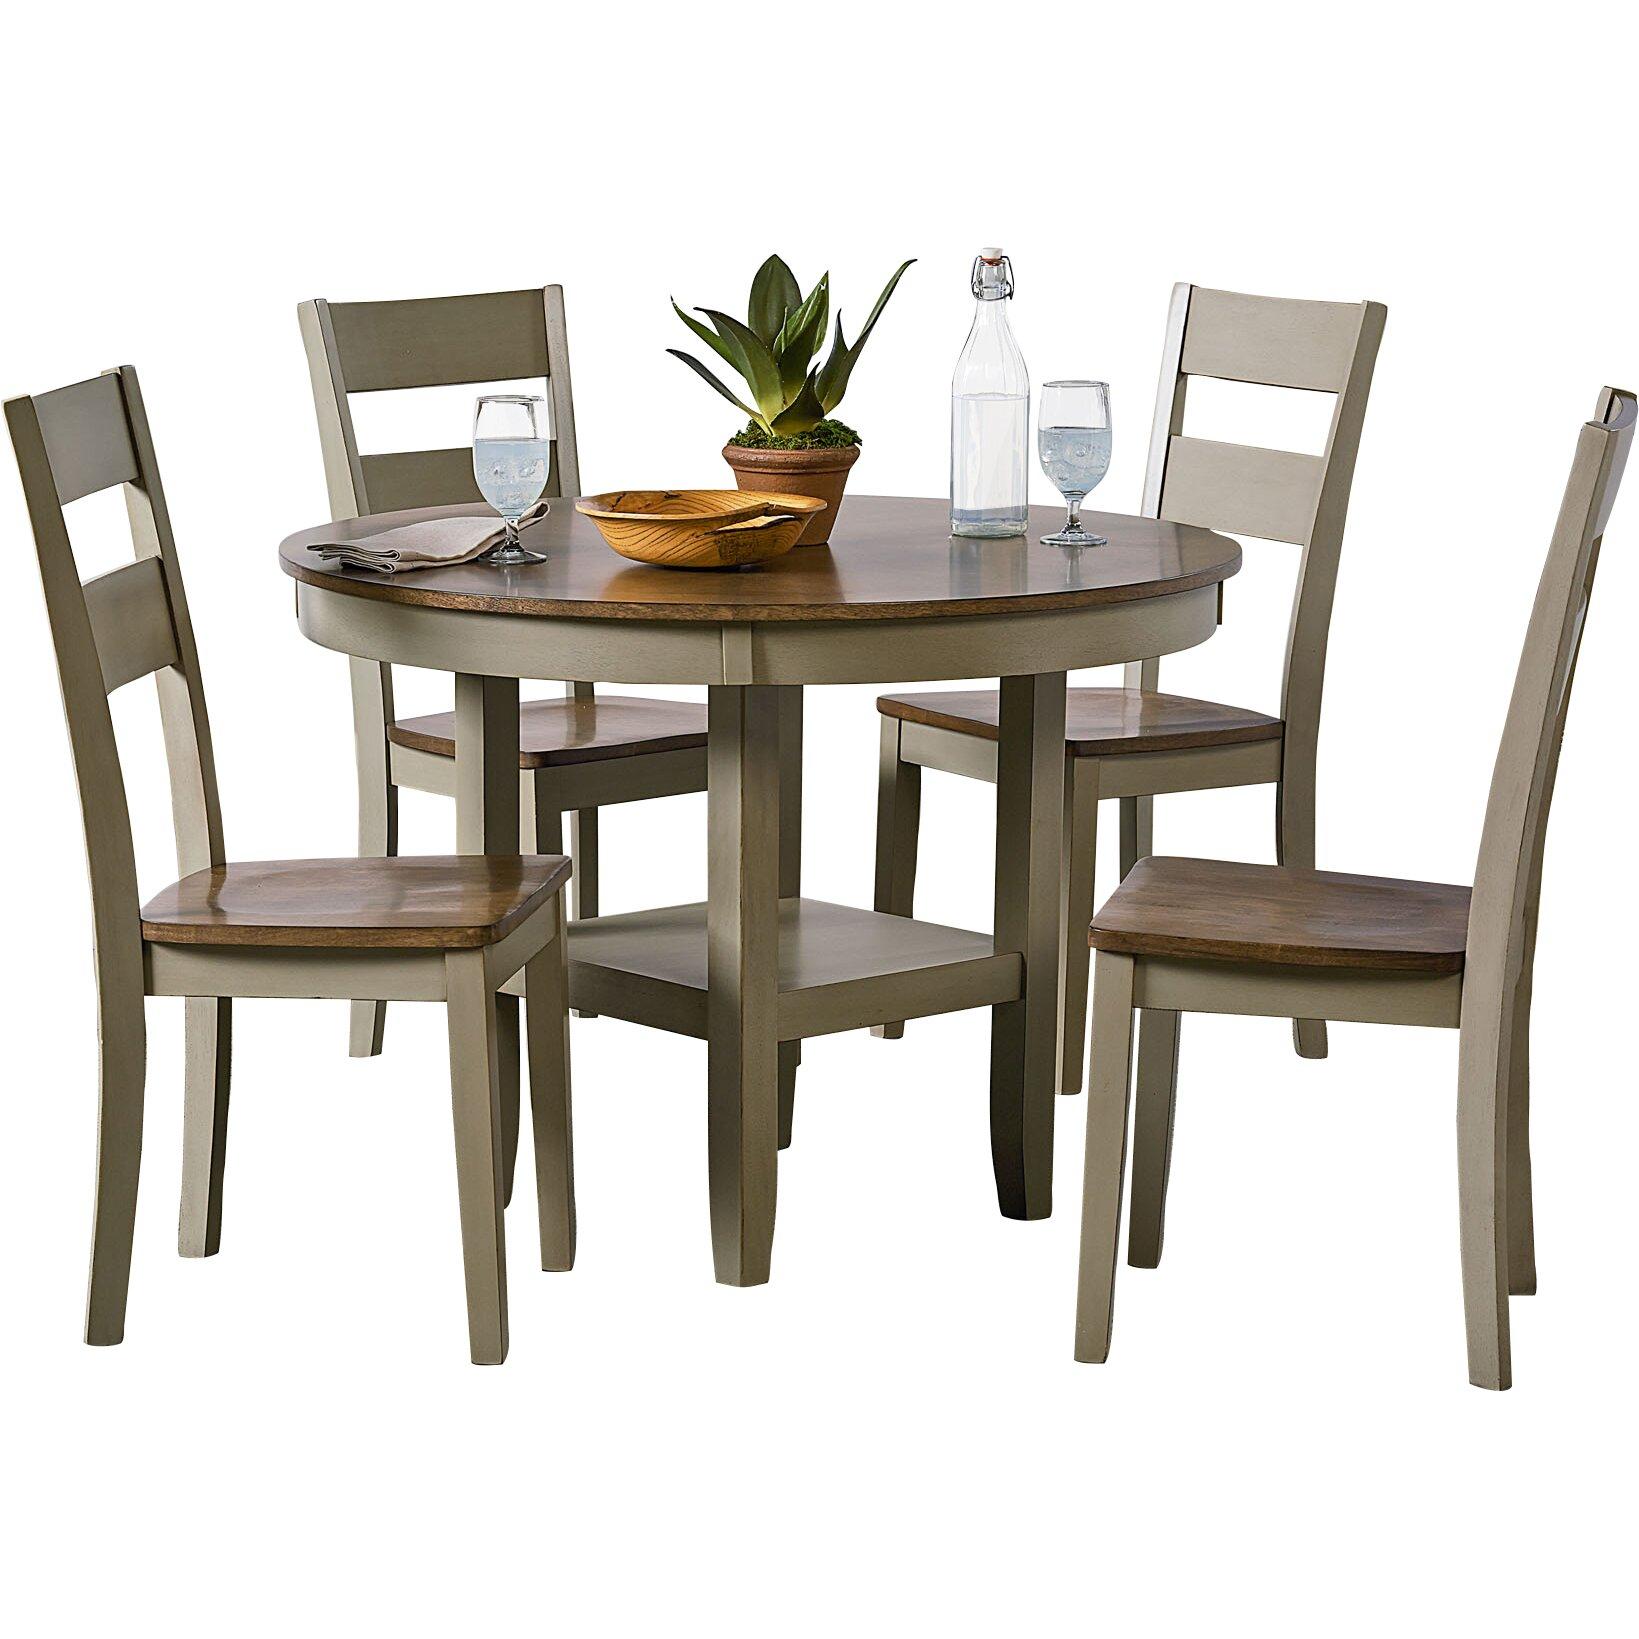 Great ... Red Barrel Studio Reg Bossier City Pendwood 5 Piece Dining Set ·  Cambria Collection Universal Patio Furniture ...